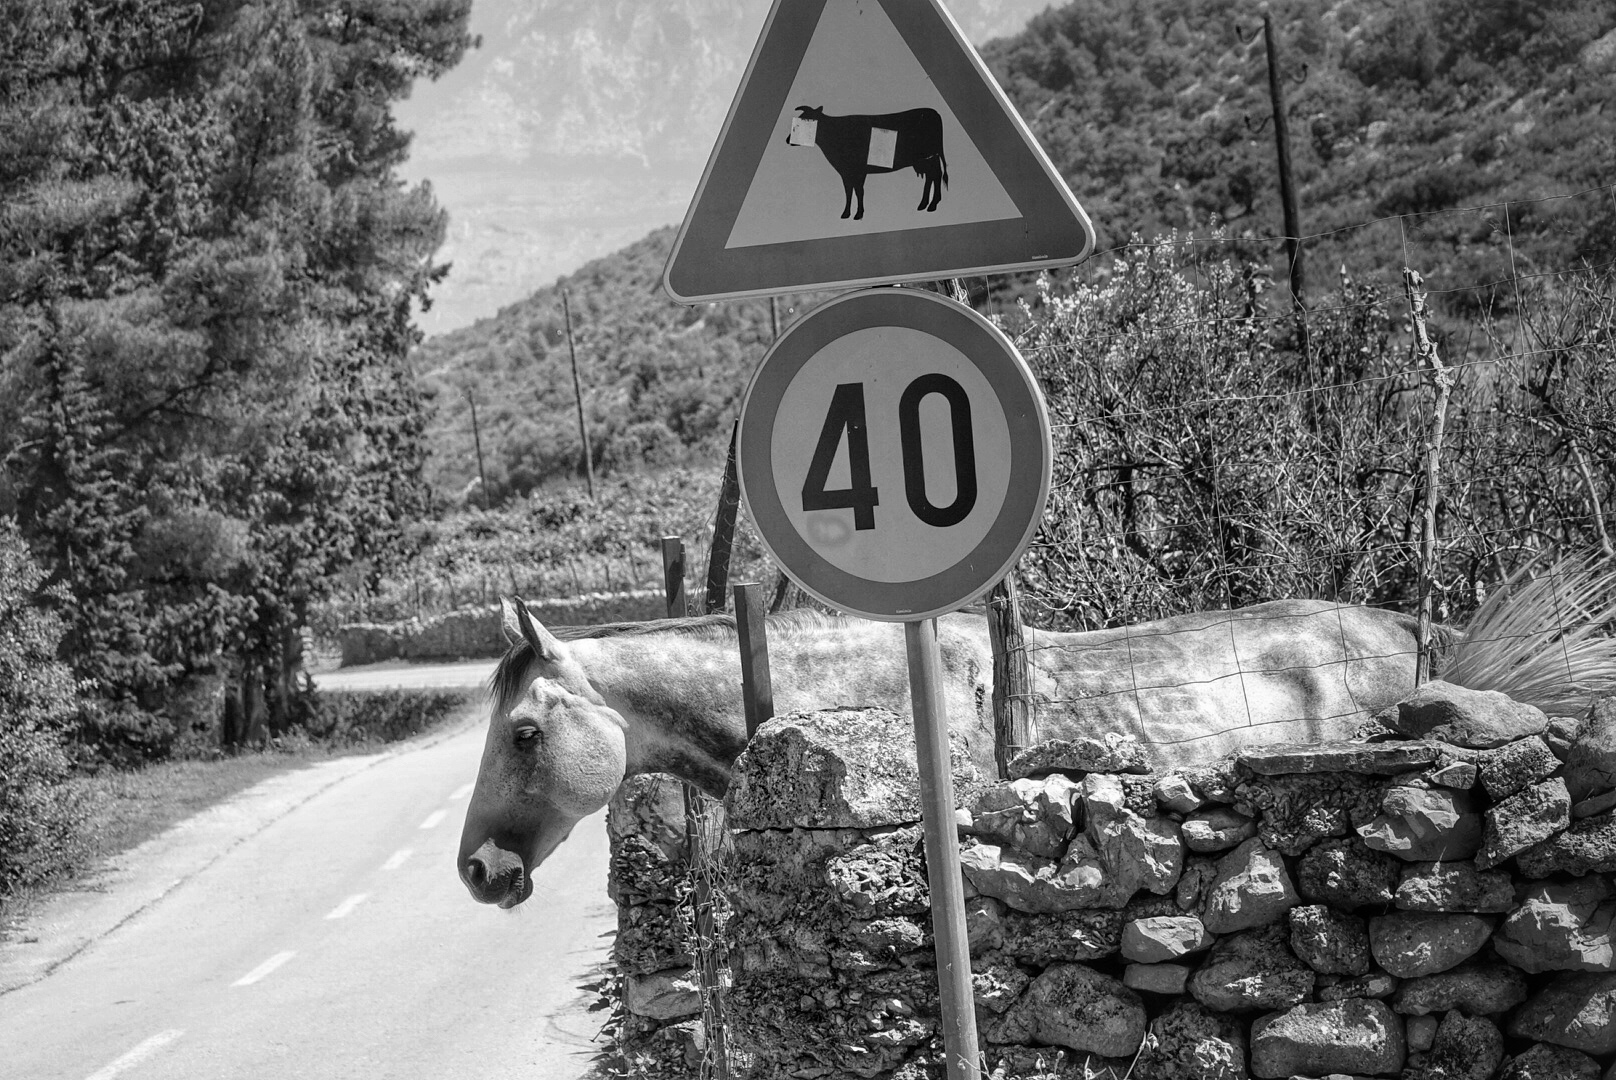 Life imitates traffic advisory